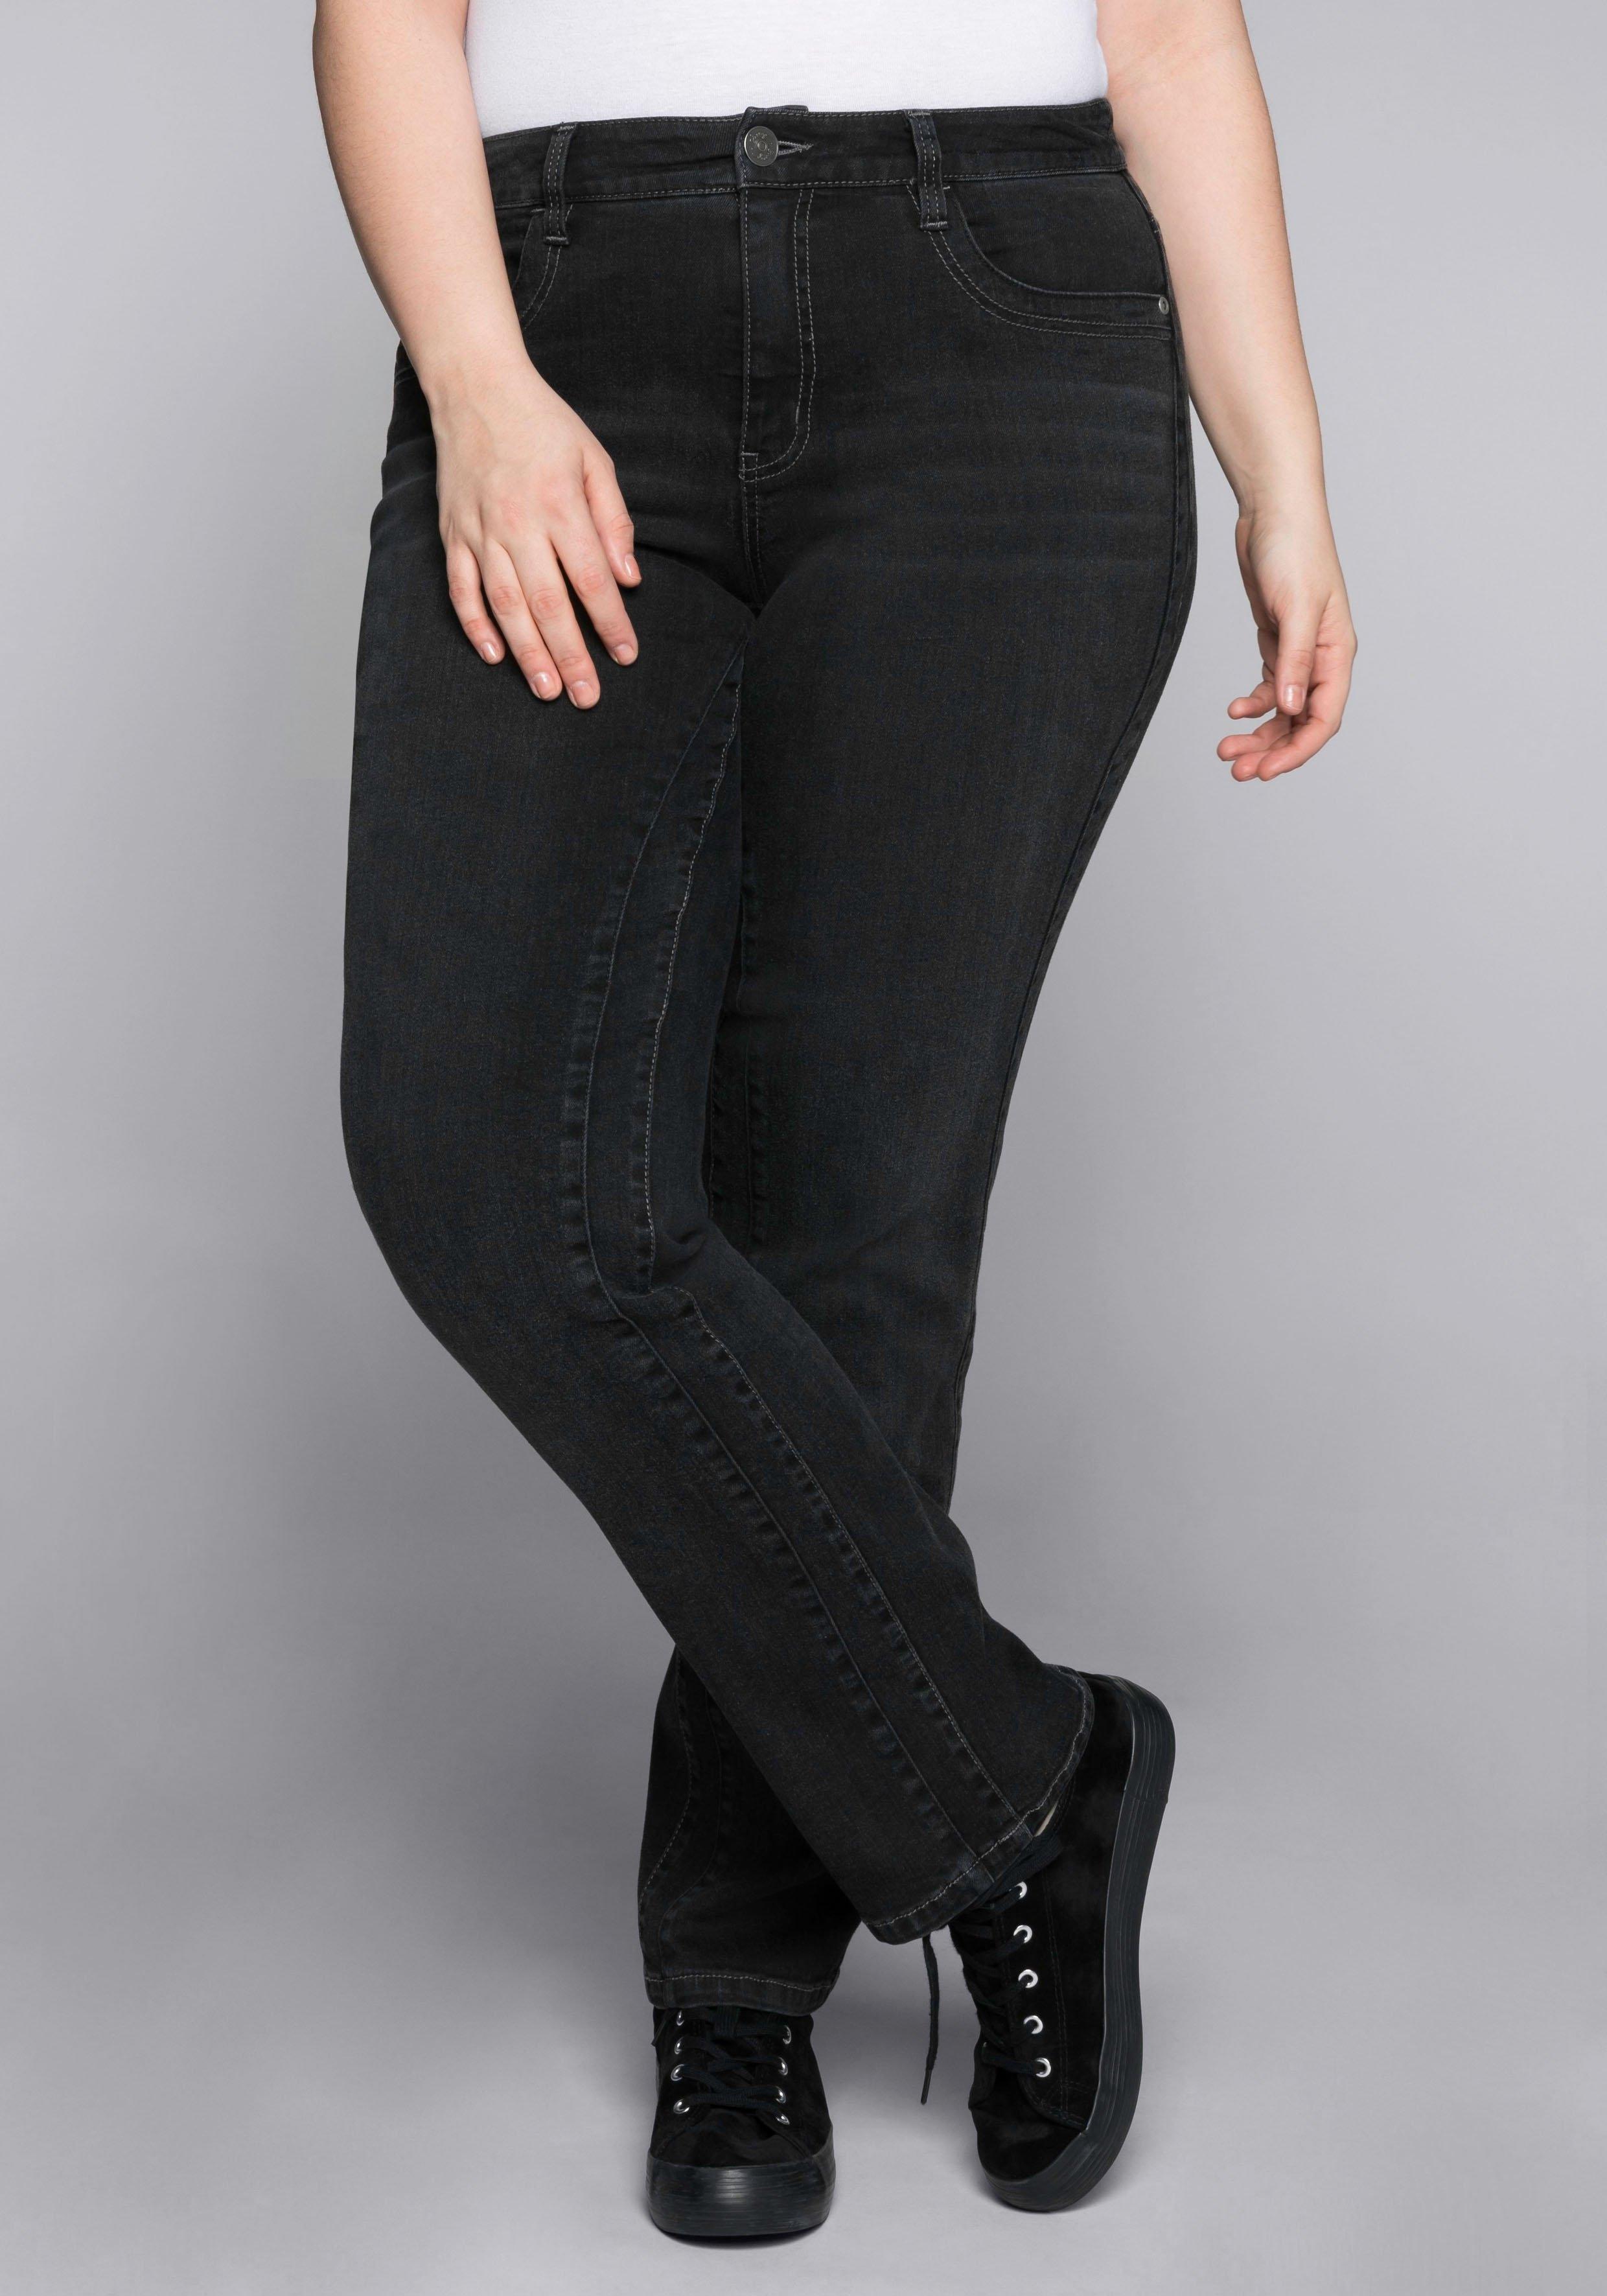 Sheego stretch jeans - gratis ruilen op otto.nl